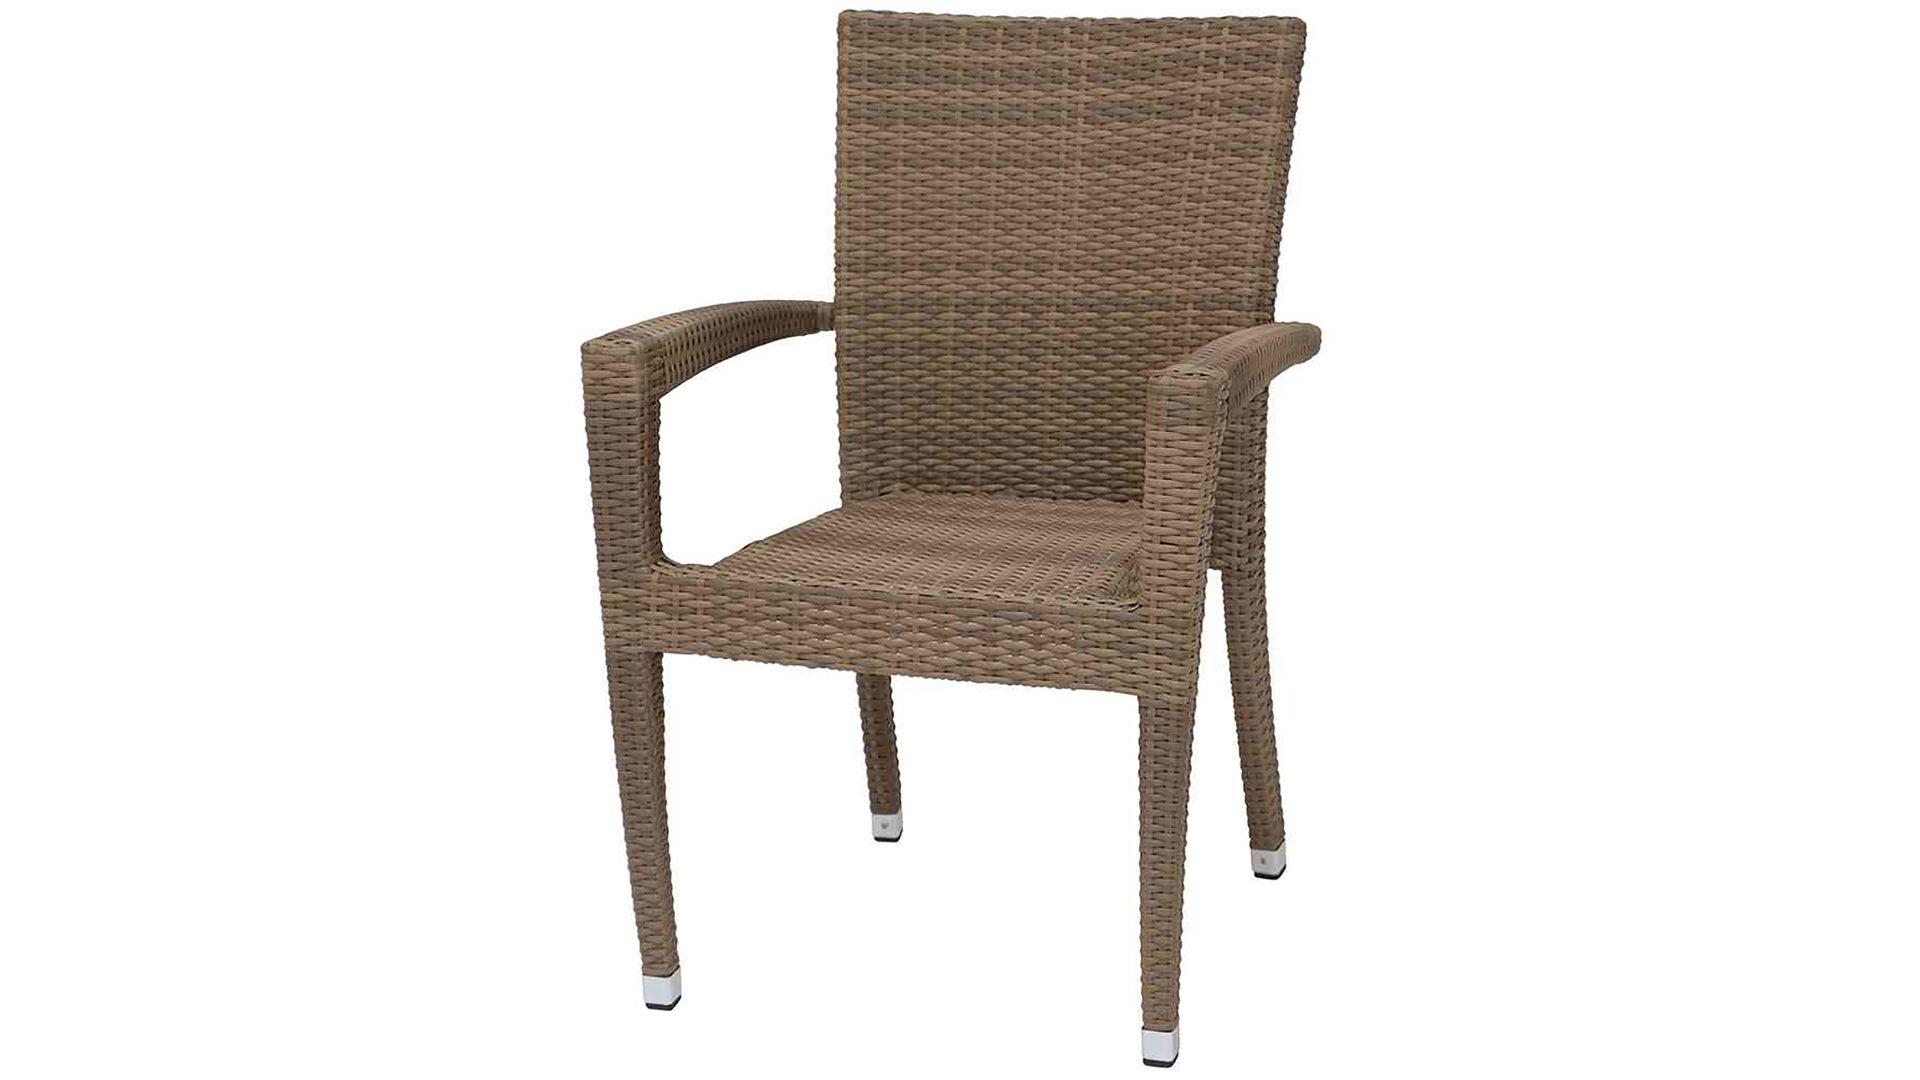 gartenmobel geflecht, einrichtungspartnerring, outdoor, geflecht-möbel, stapelstühle, Design ideen